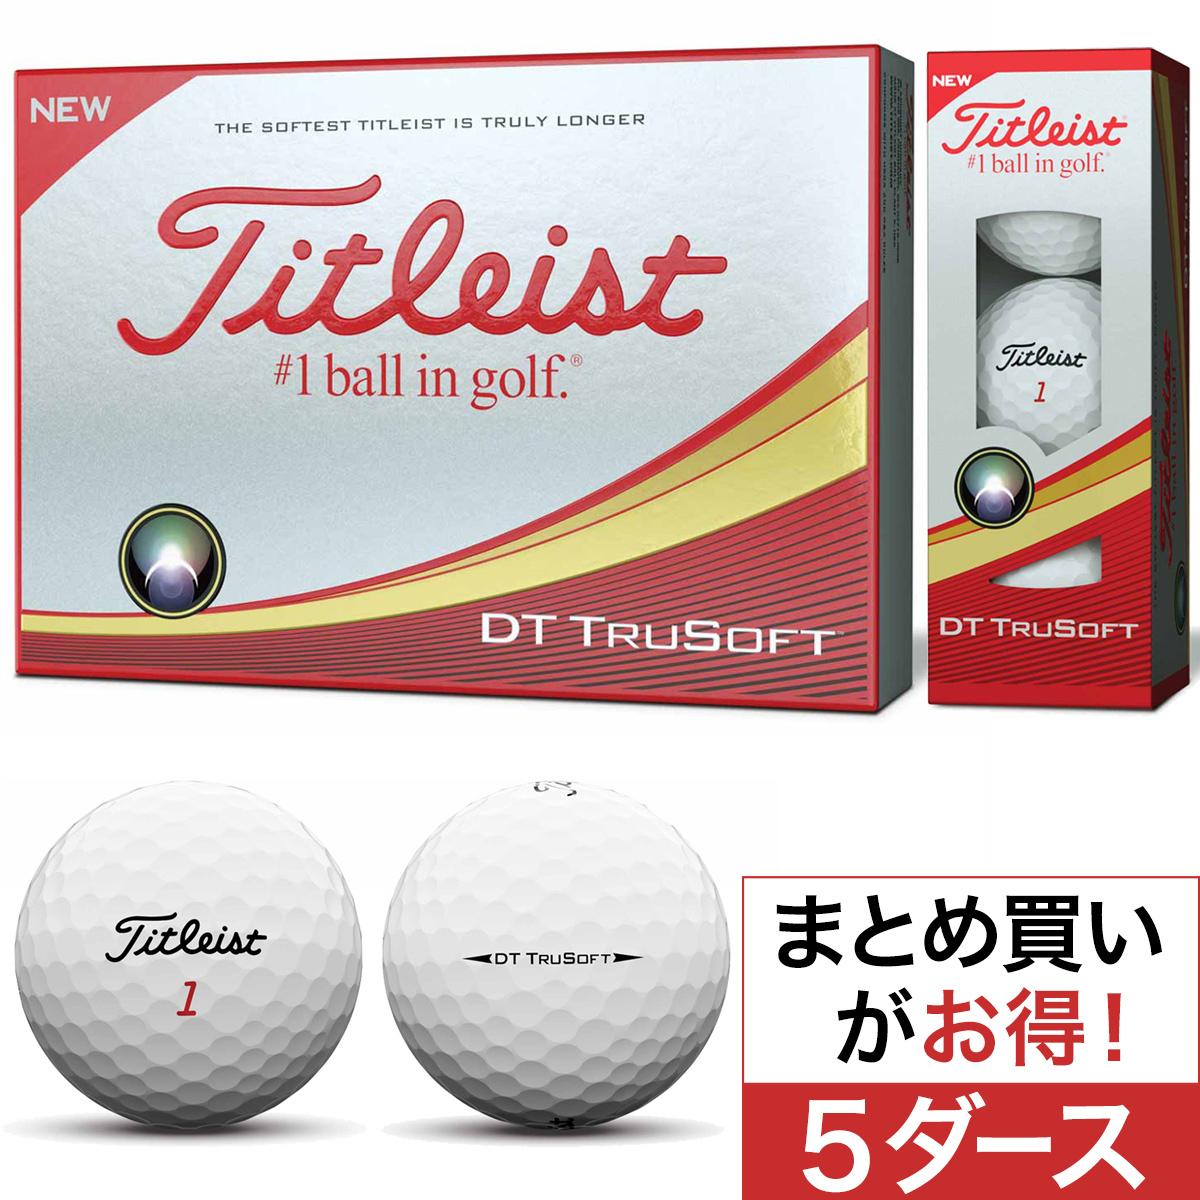 DT TRUSOFT ボール 2018年モデル 5ダース